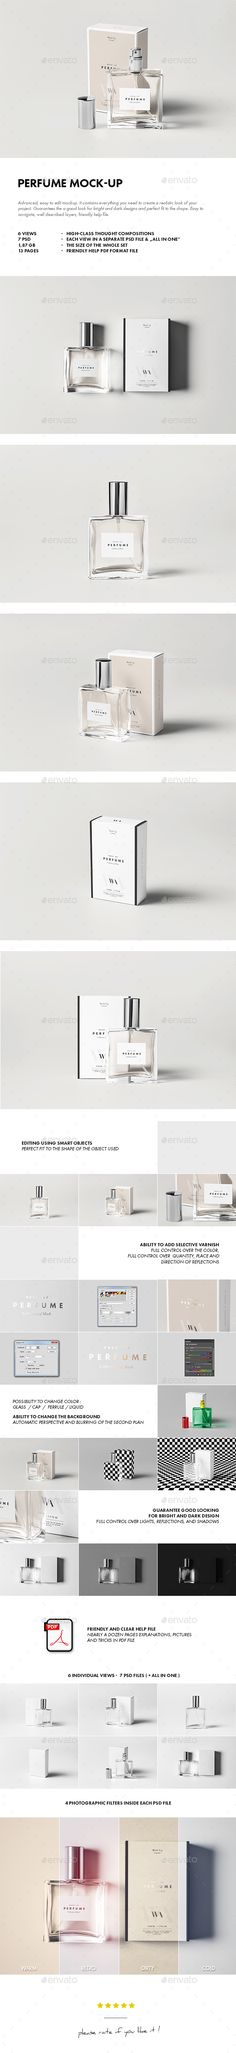 Perfume Mock-up #design Download: http://graphicriver.net/item/perfume-mockup/13148737?s_phrase=&s_rank=15&ref=ksioks